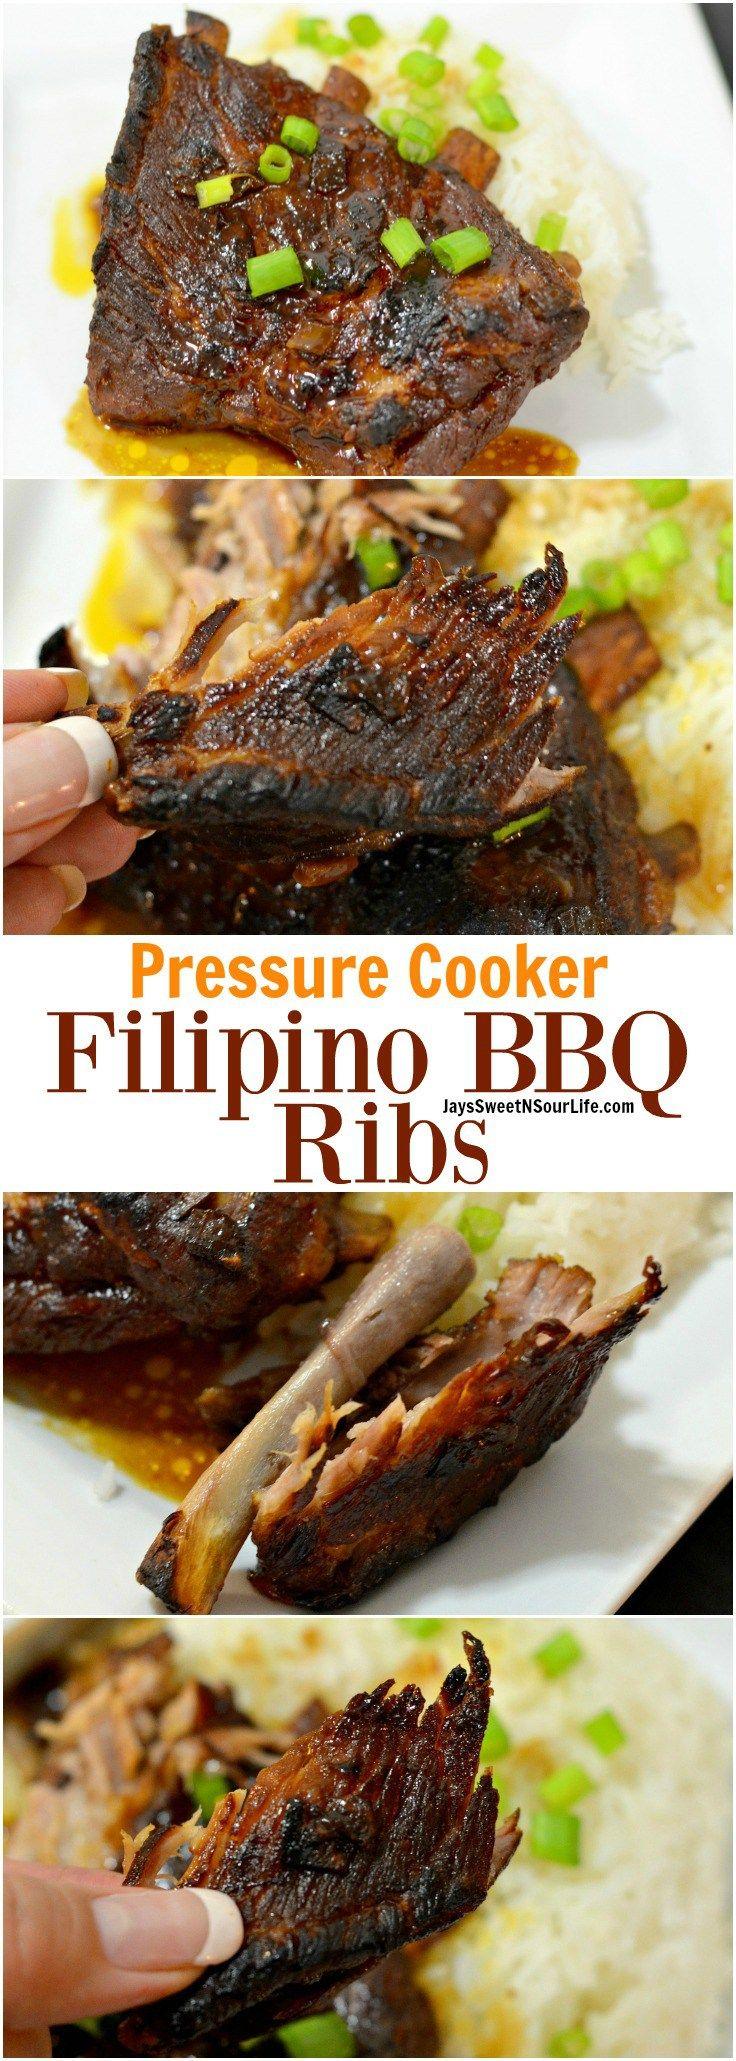 11 Instant Pot Filipino Recipes Ideas Recipes Filipino Recipes Instant Pot Recipes